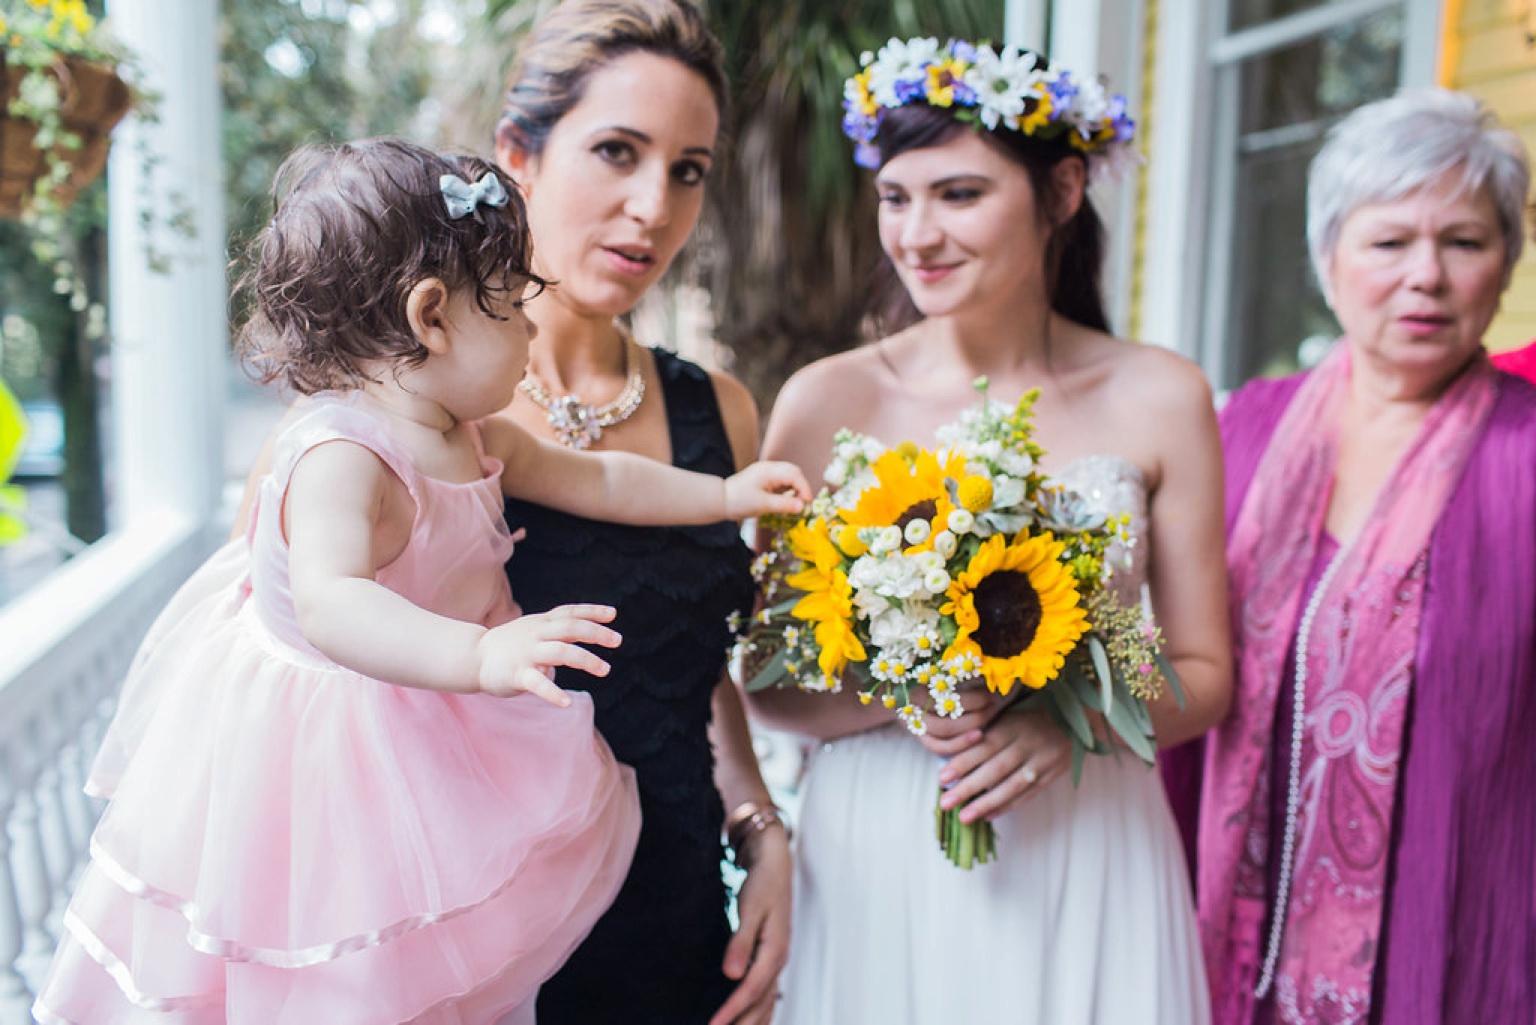 Apt_B_Photo_Savannah_Wedding_Photographer_Flower_Crown036.JPG